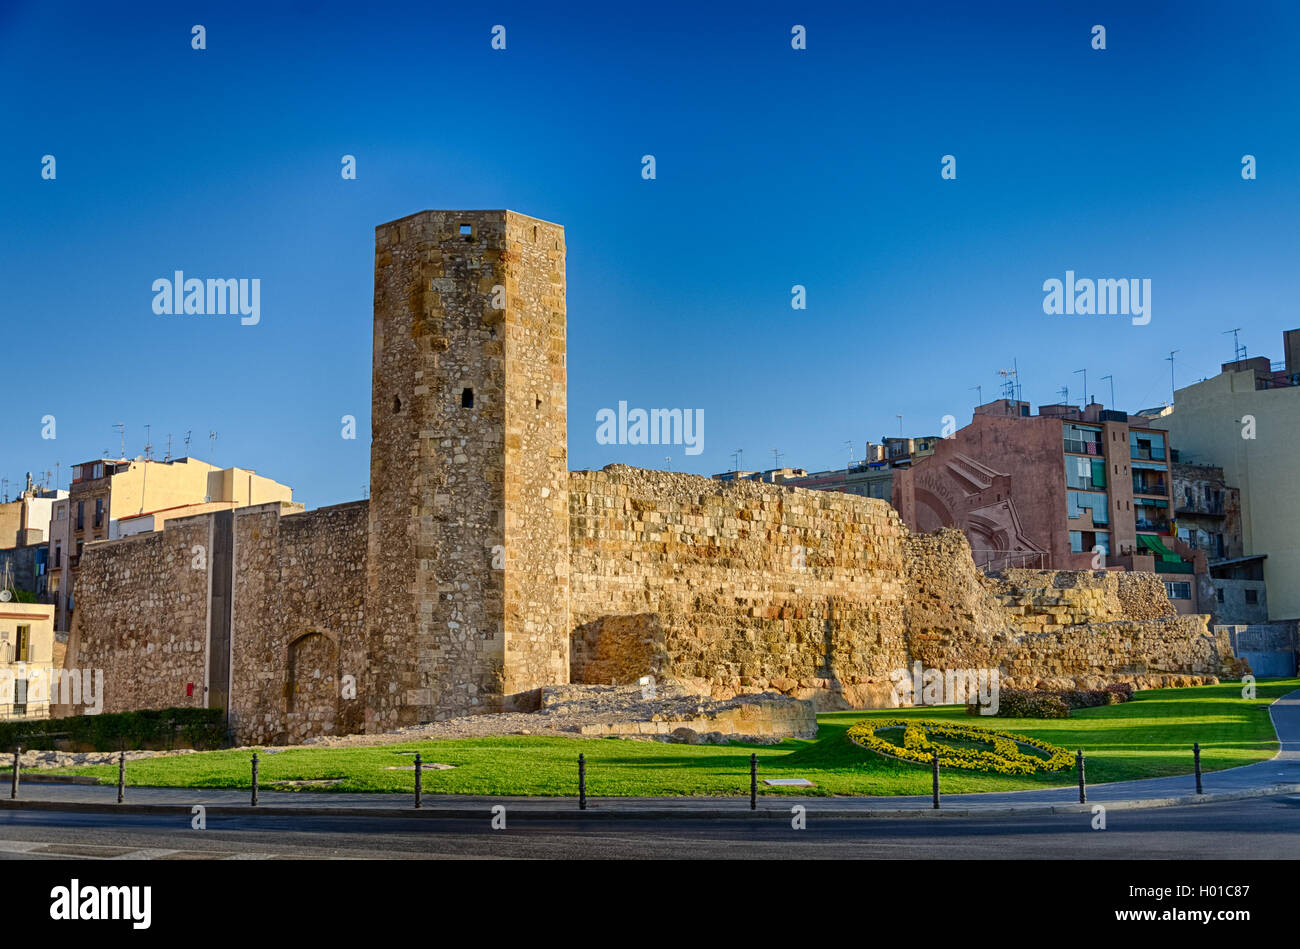 Ancient roman tower in sunrise light Tarragona, Spain - Stock Image